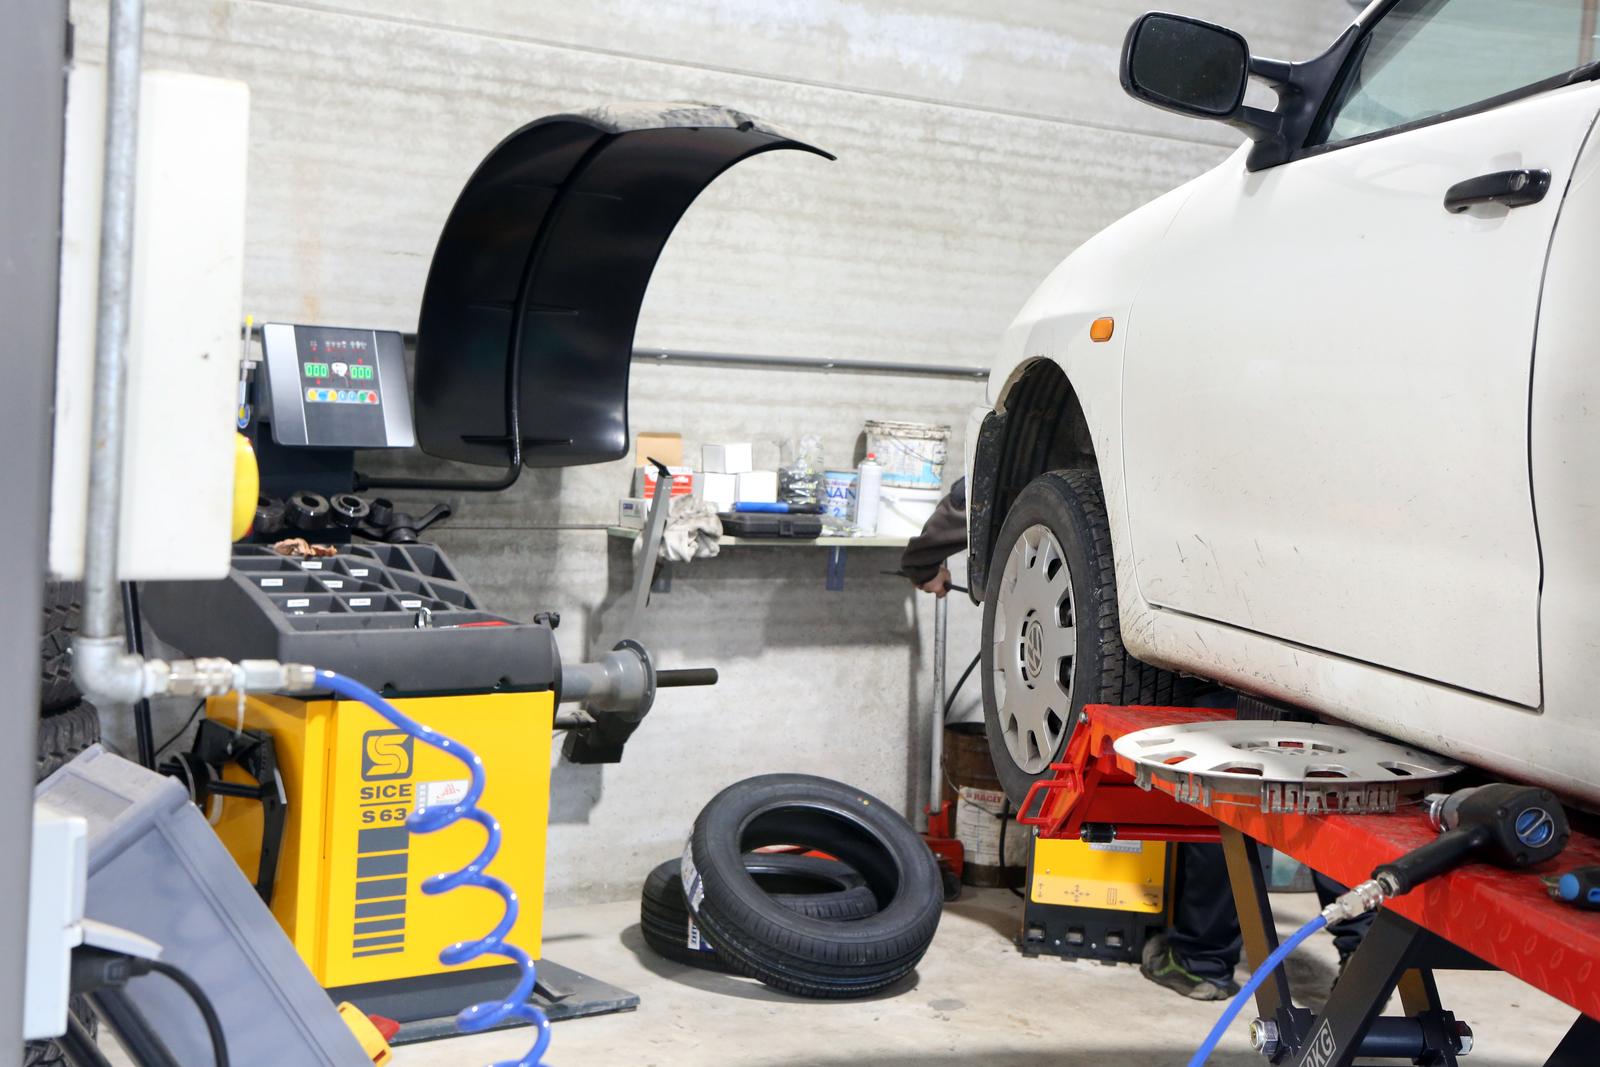 tarif equilibrage pneu quelques liens utiles tarif de pneus tarifs montage pneus tarif pneus v. Black Bedroom Furniture Sets. Home Design Ideas